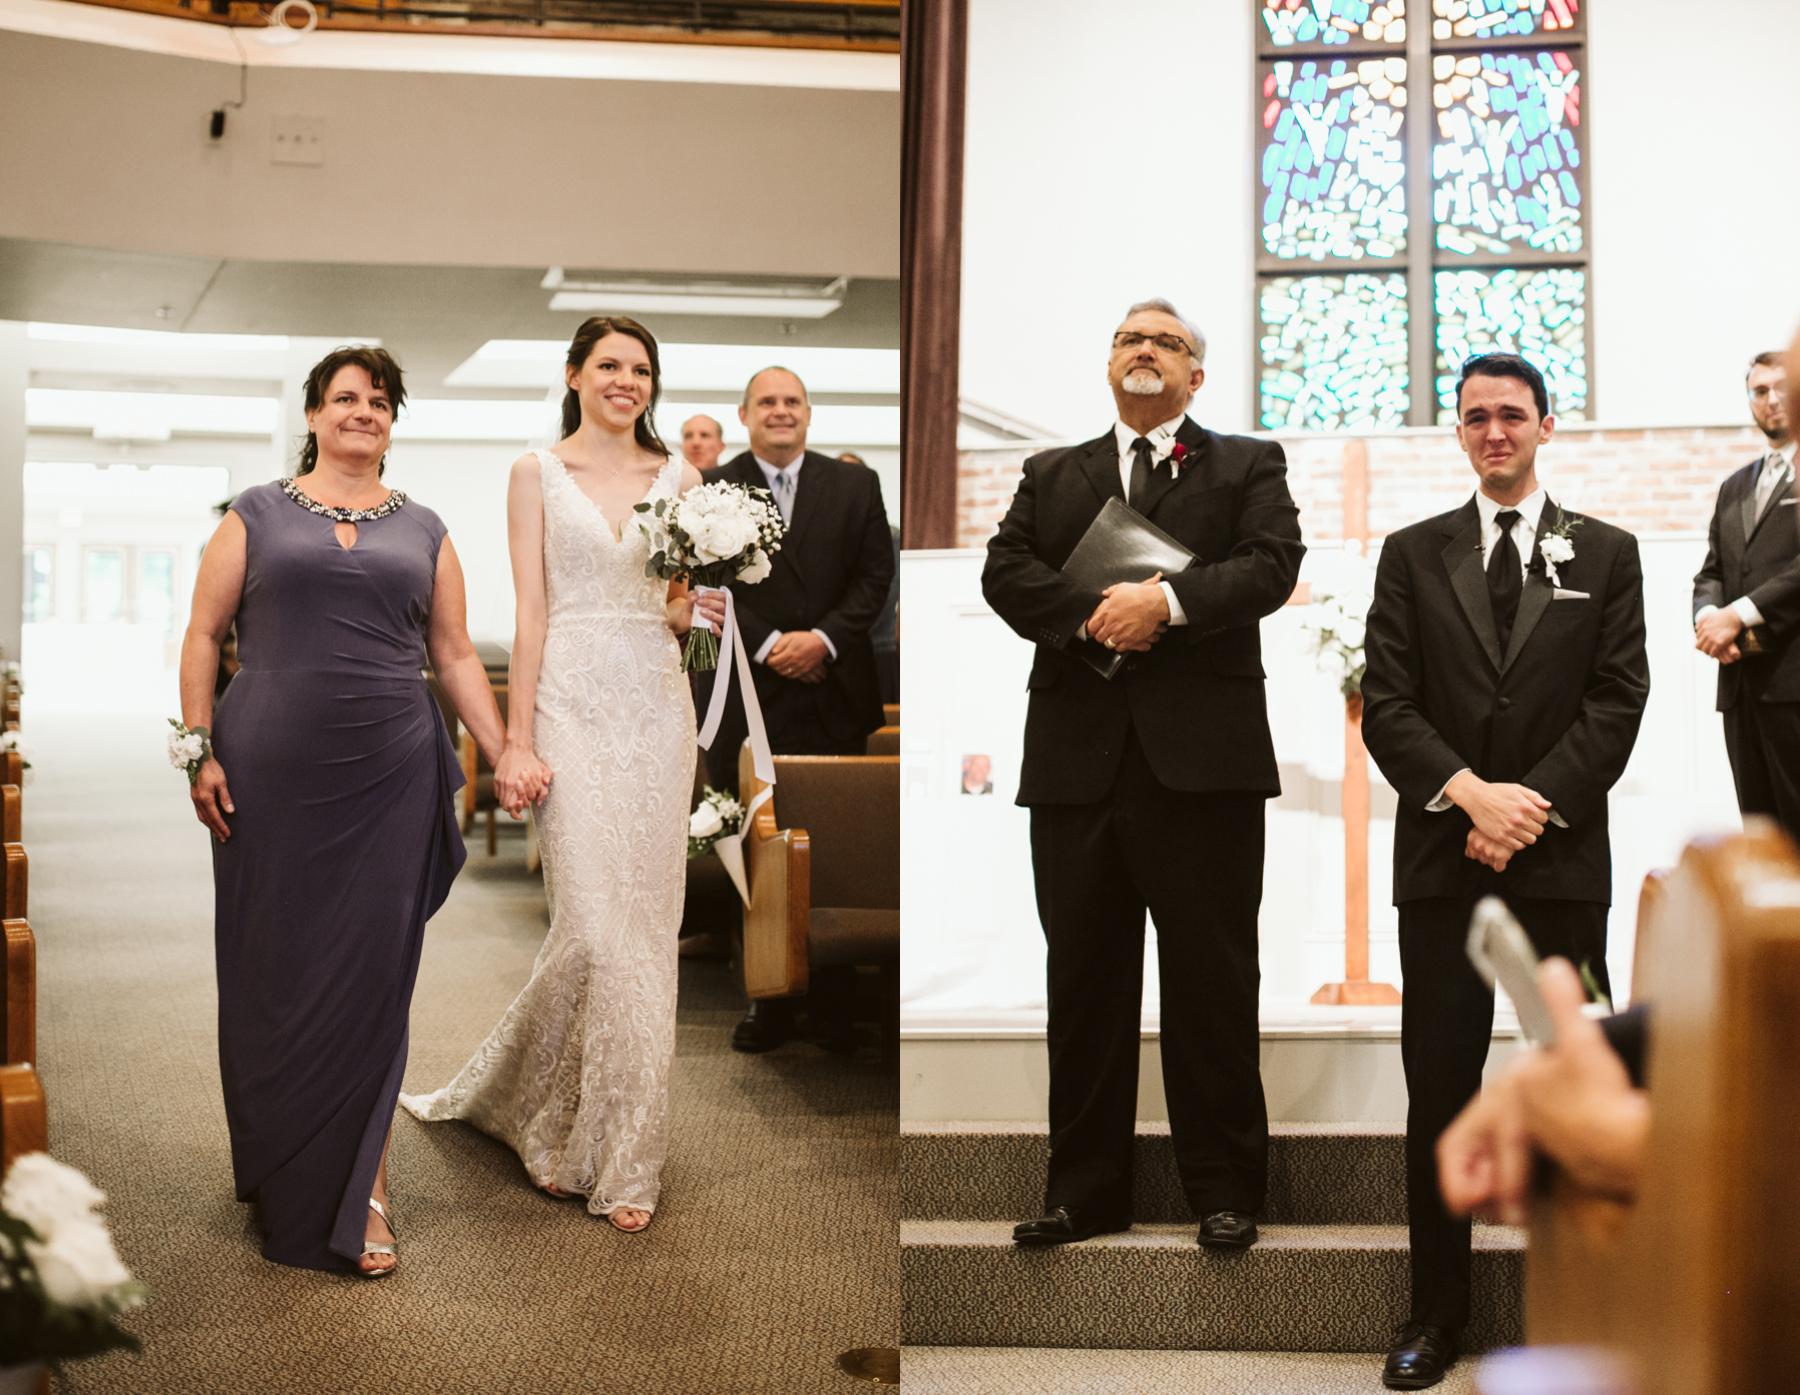 brentwood-hills-church-wedding-3.jpg